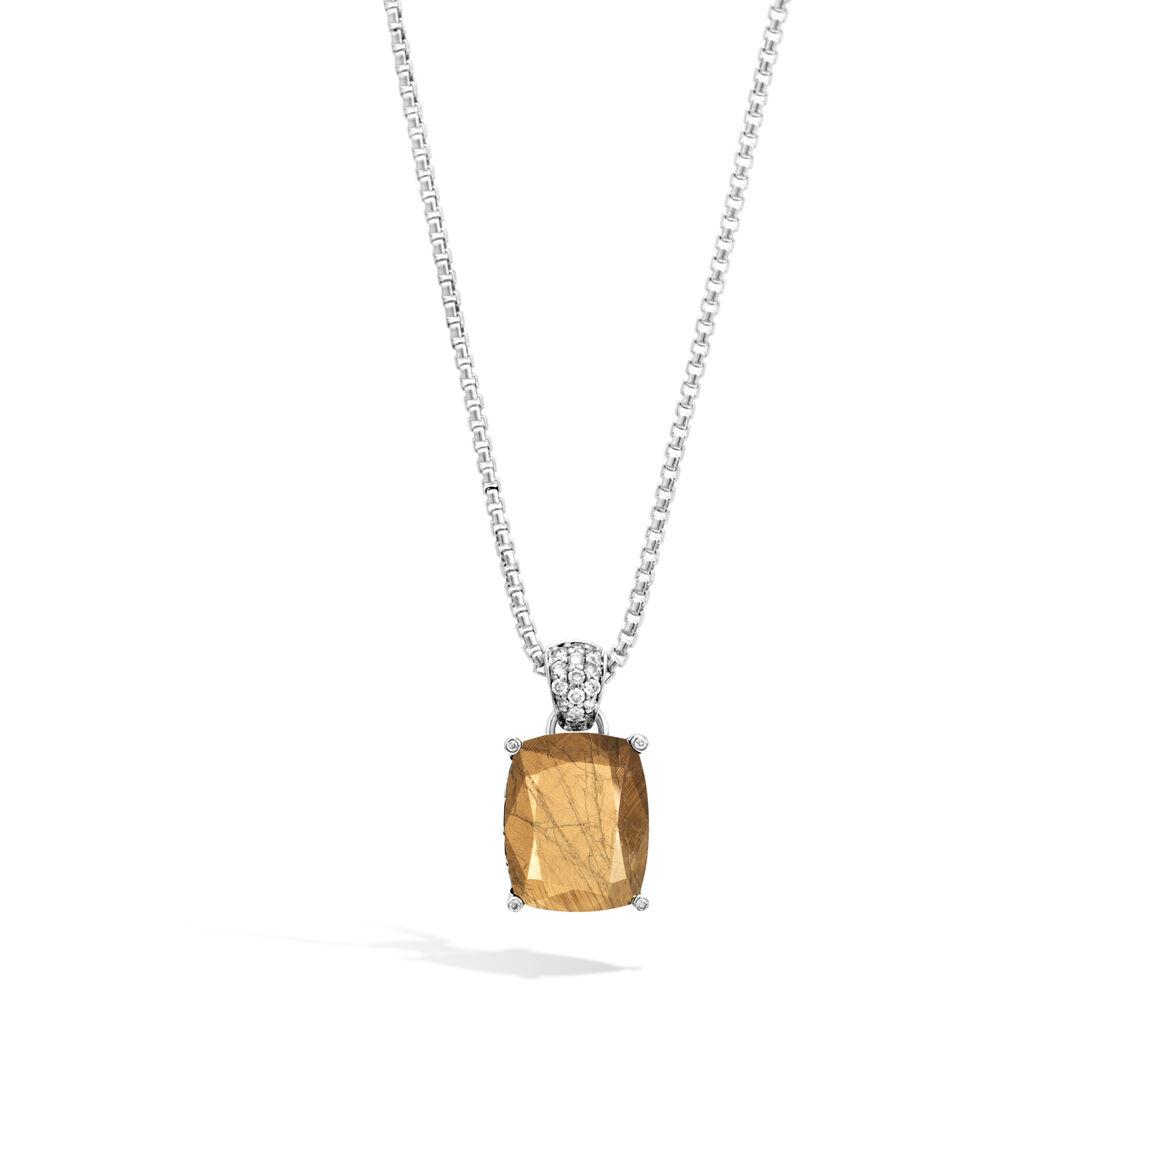 Classic Chain Magic Cut Pendant, Silver, Gemstone, Diamonds